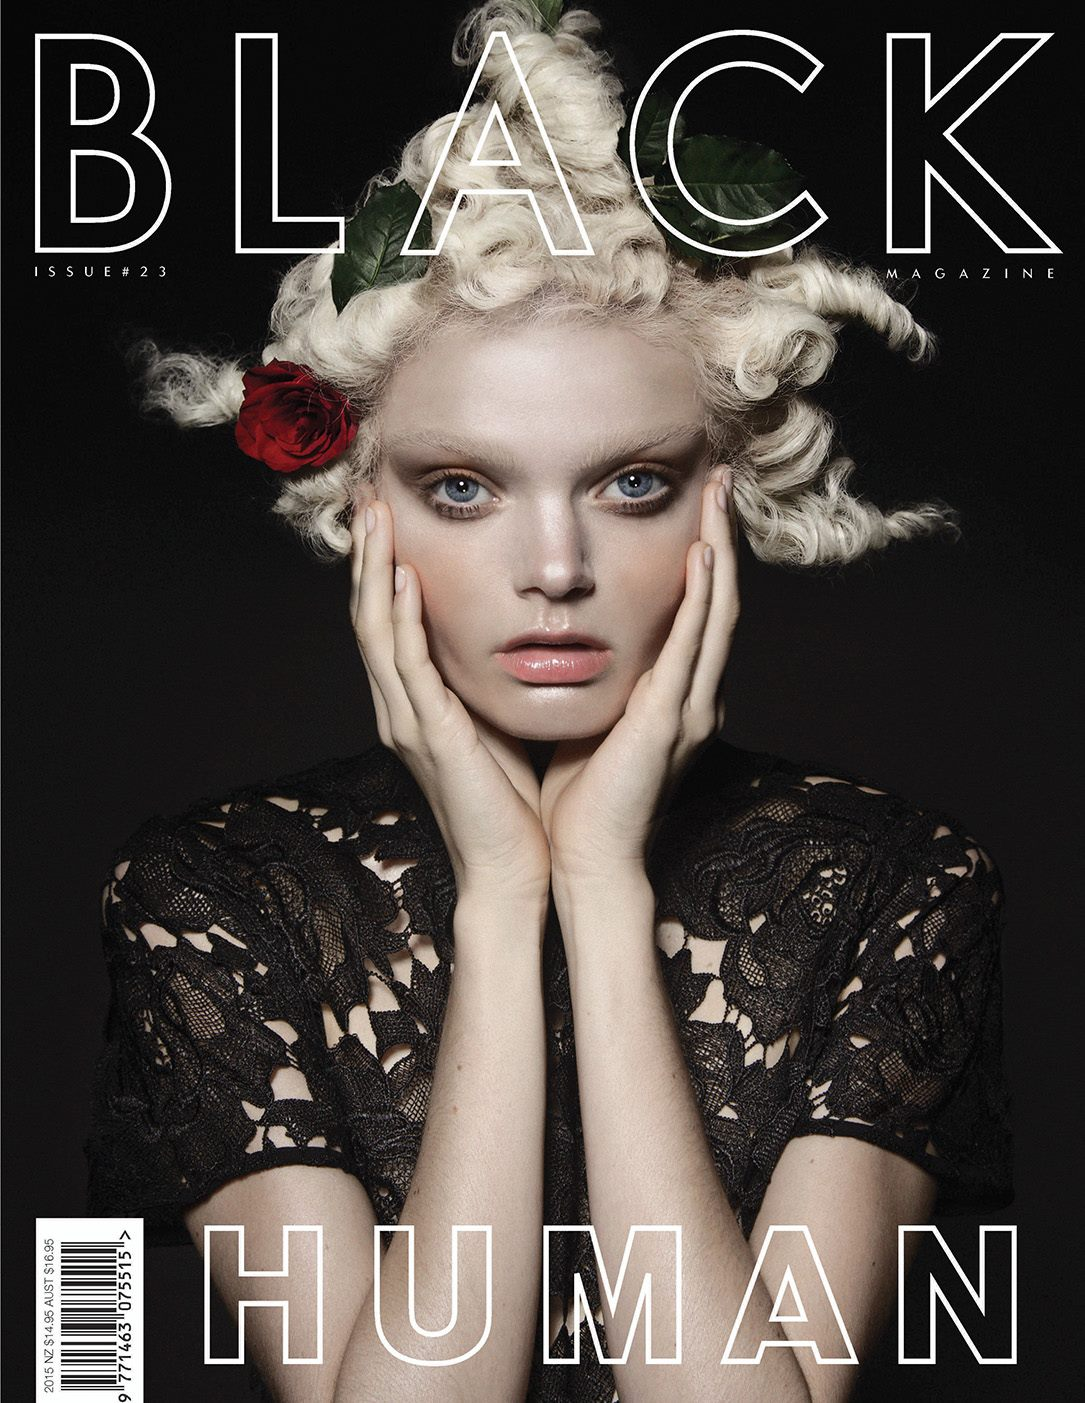 Marthe+Wiggers+Black+Magazine+Cover+2015.jpg